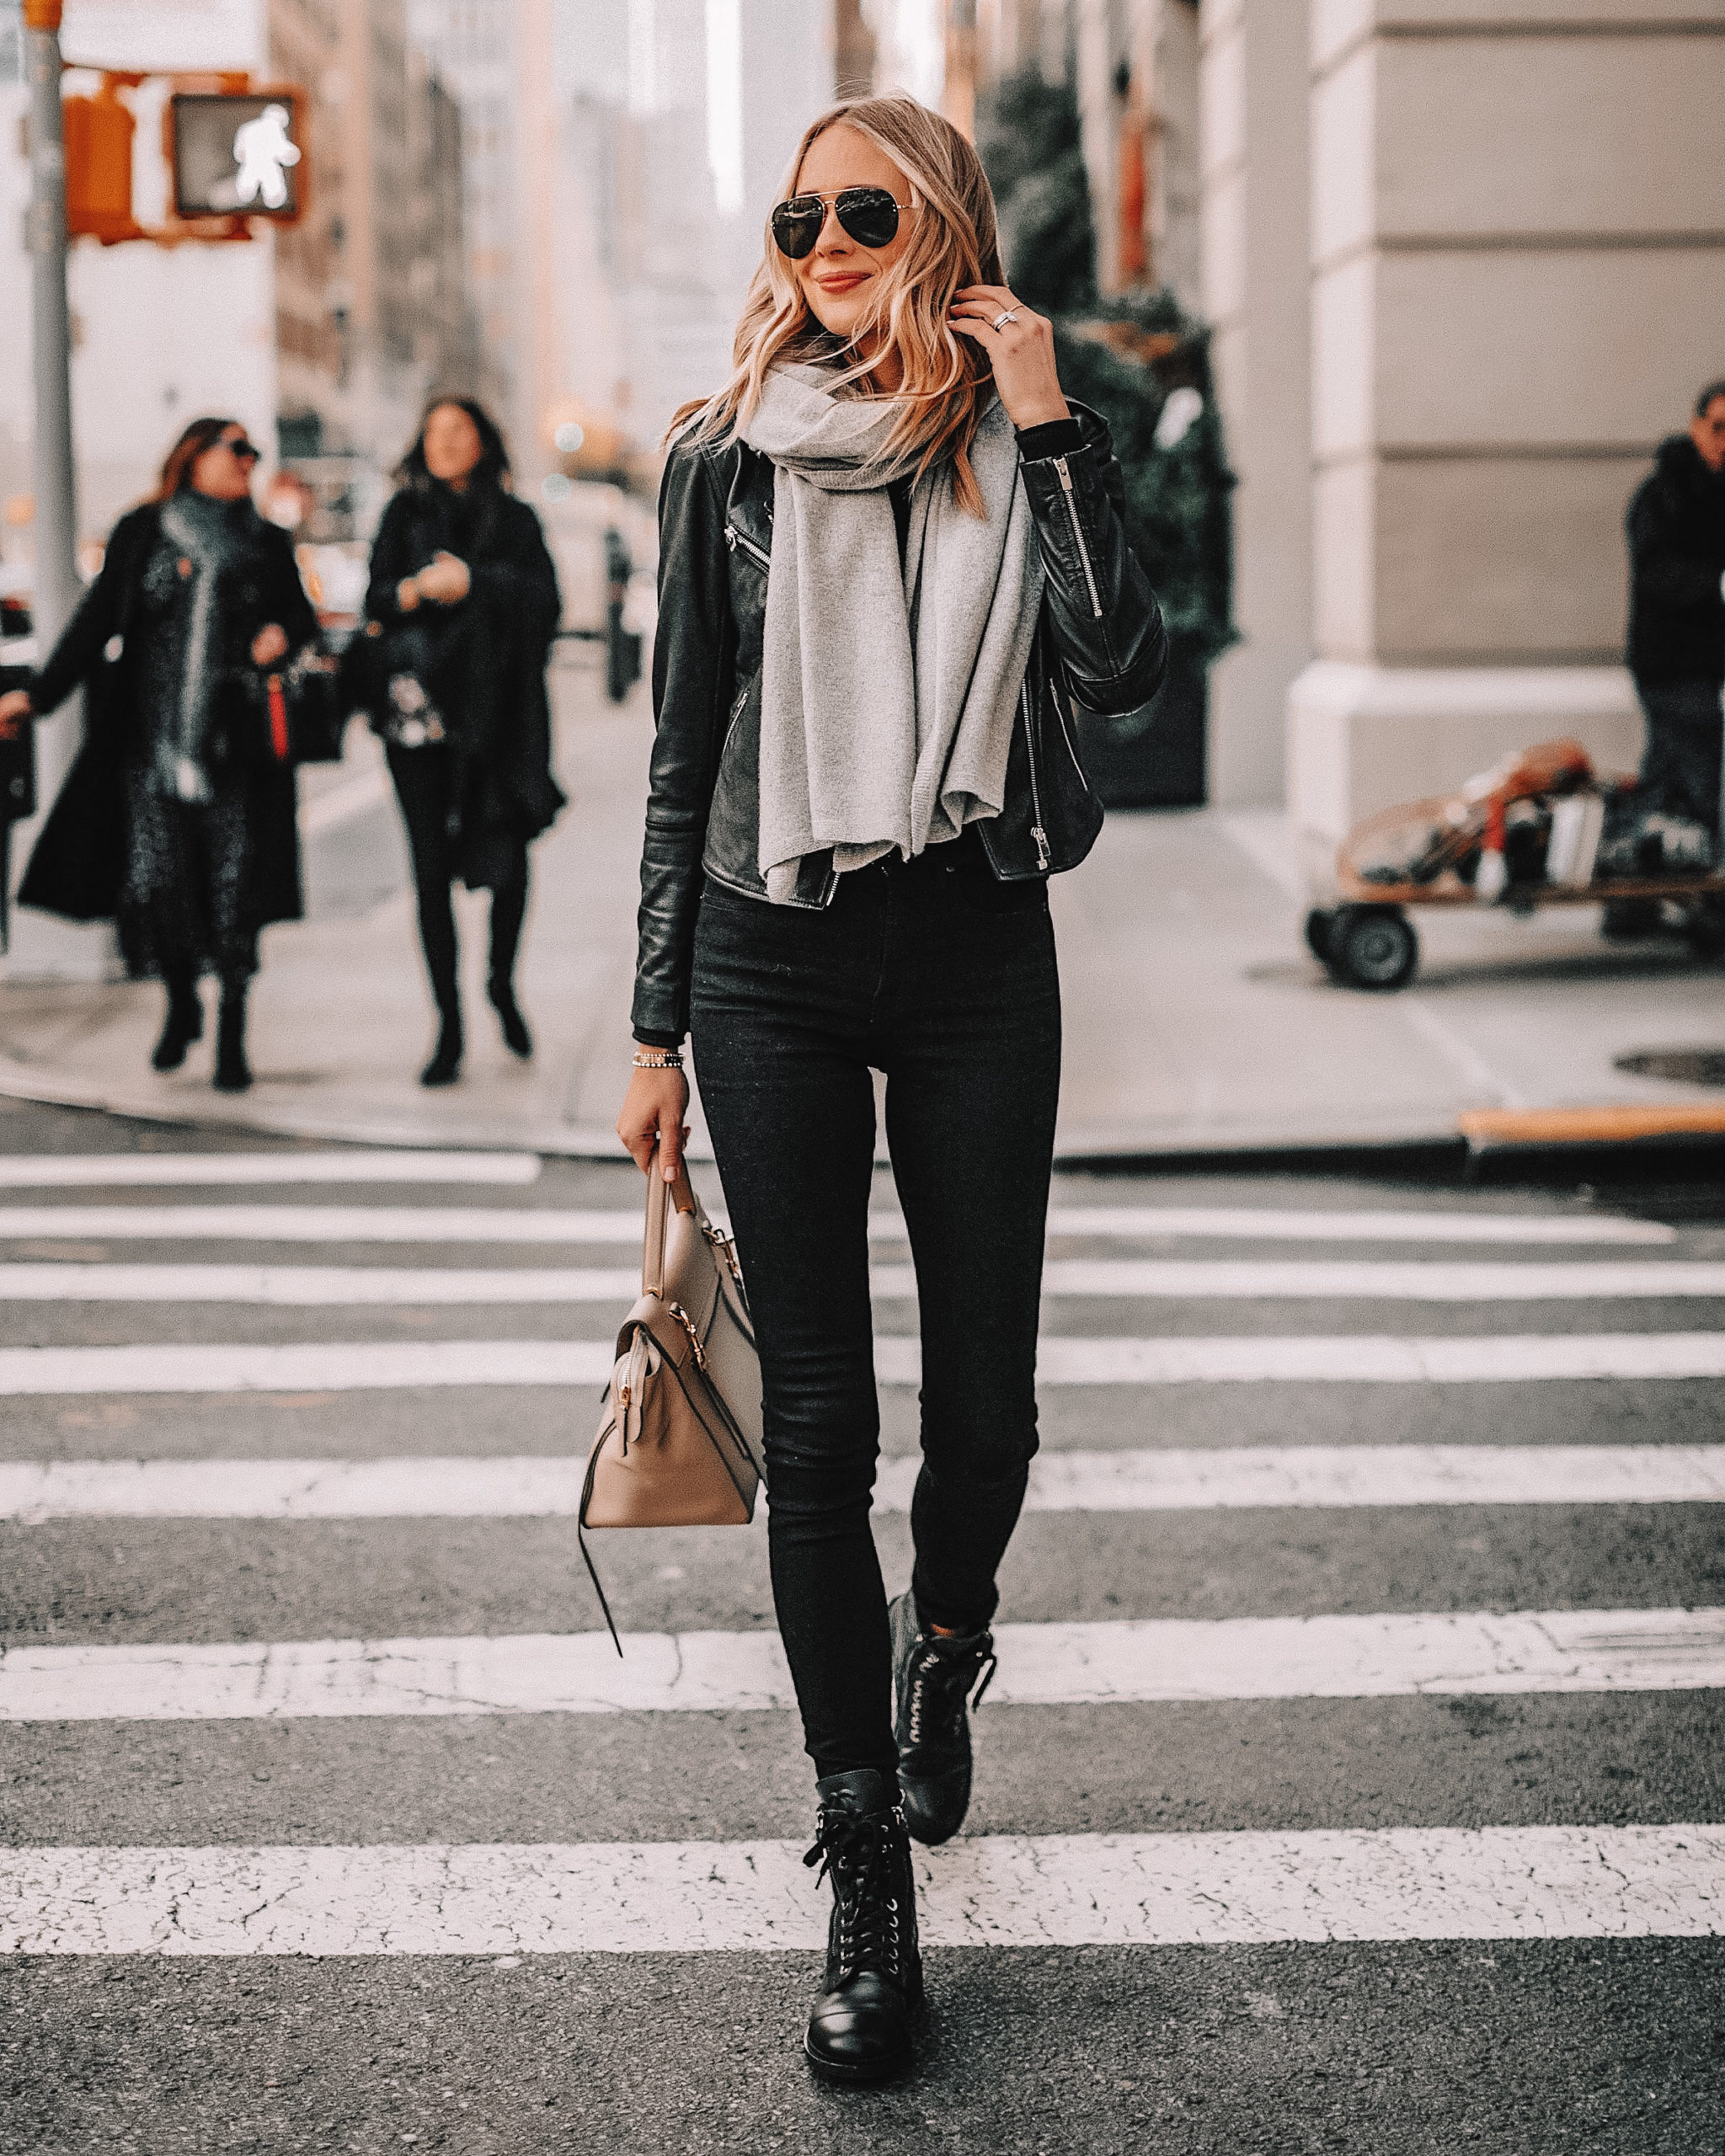 Fashion Jackson Wearing Black Leather Jacket Black Skinny Jeans Grey Scarf Black Chanel Combat Boots